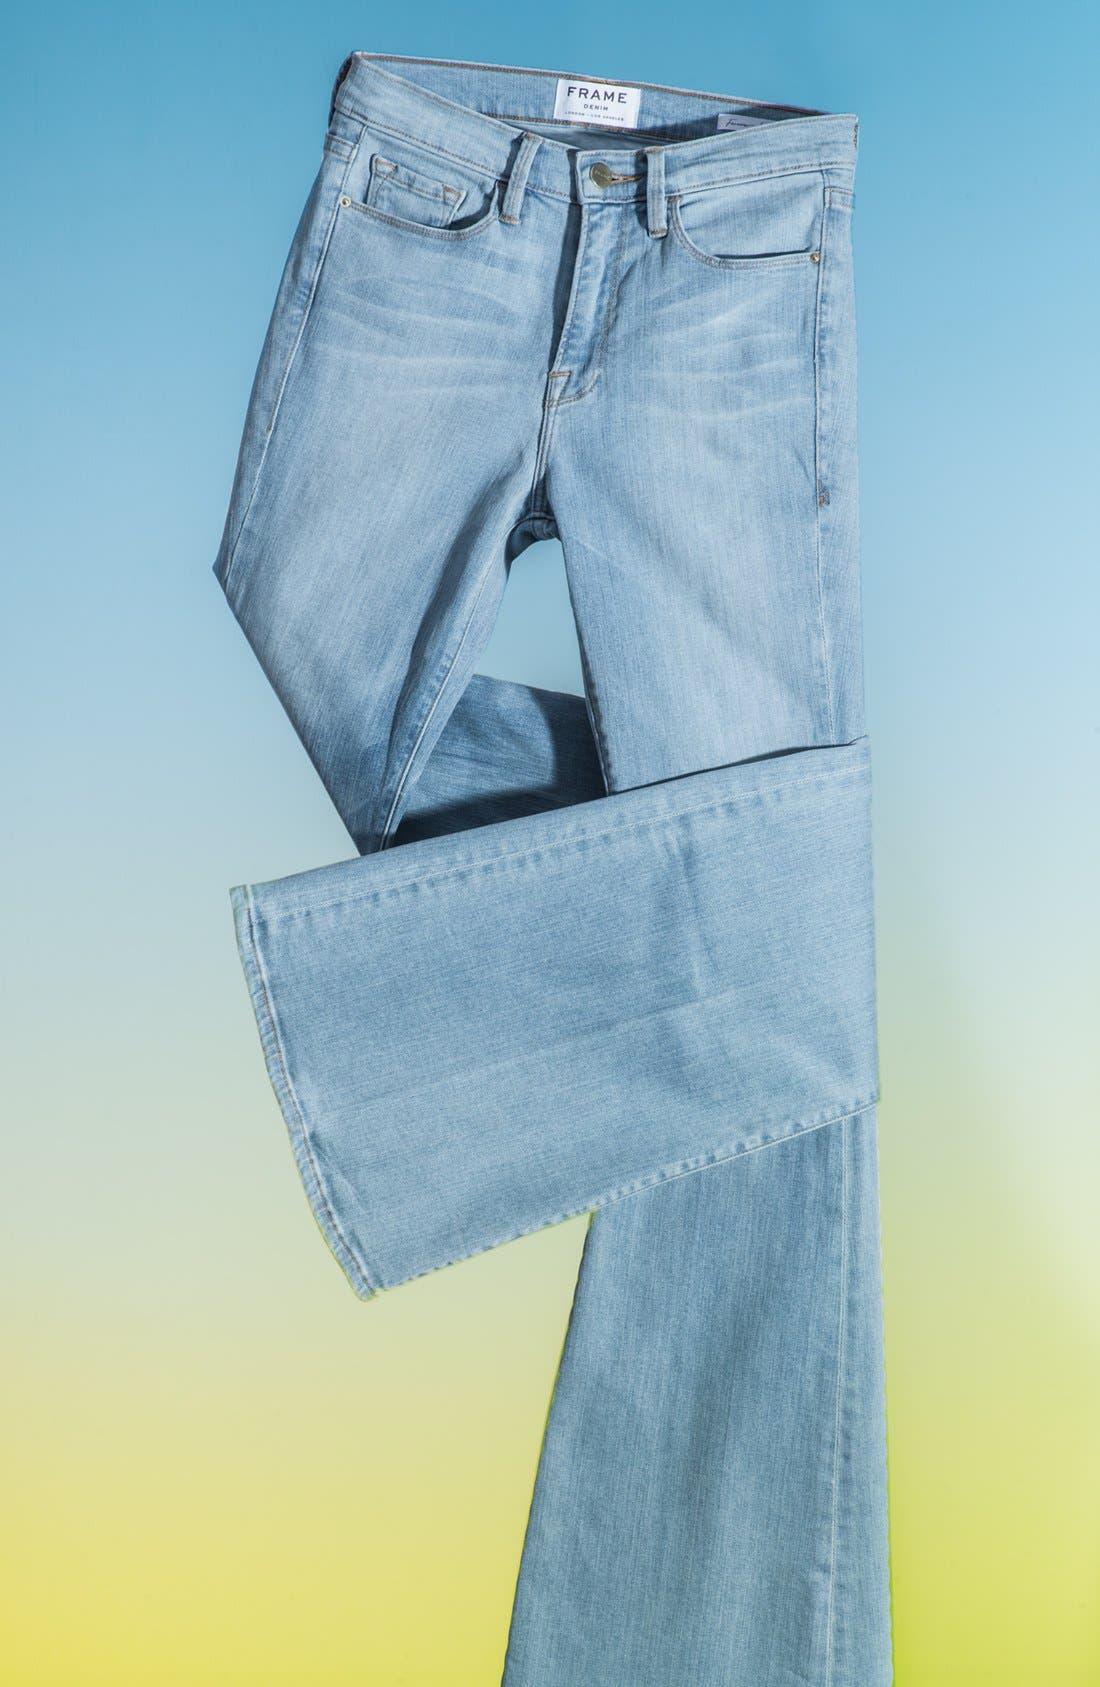 Main Image - Frame Denim 'Forever Karlie' Flared Jeans (Redchurch Street)